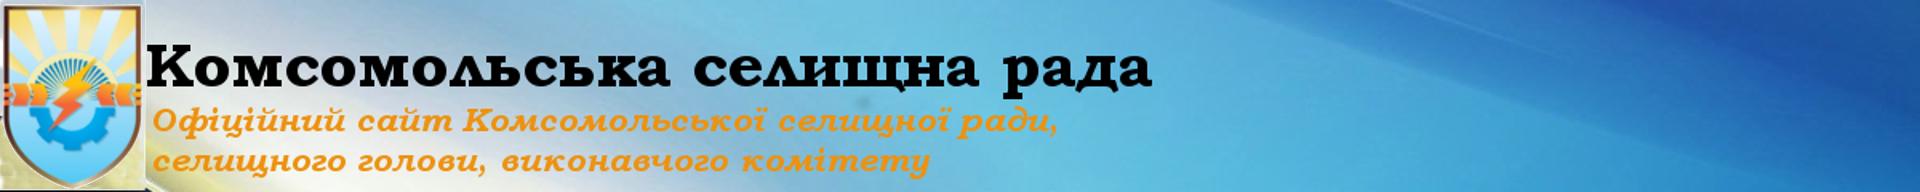 Комсомольська селищна рада